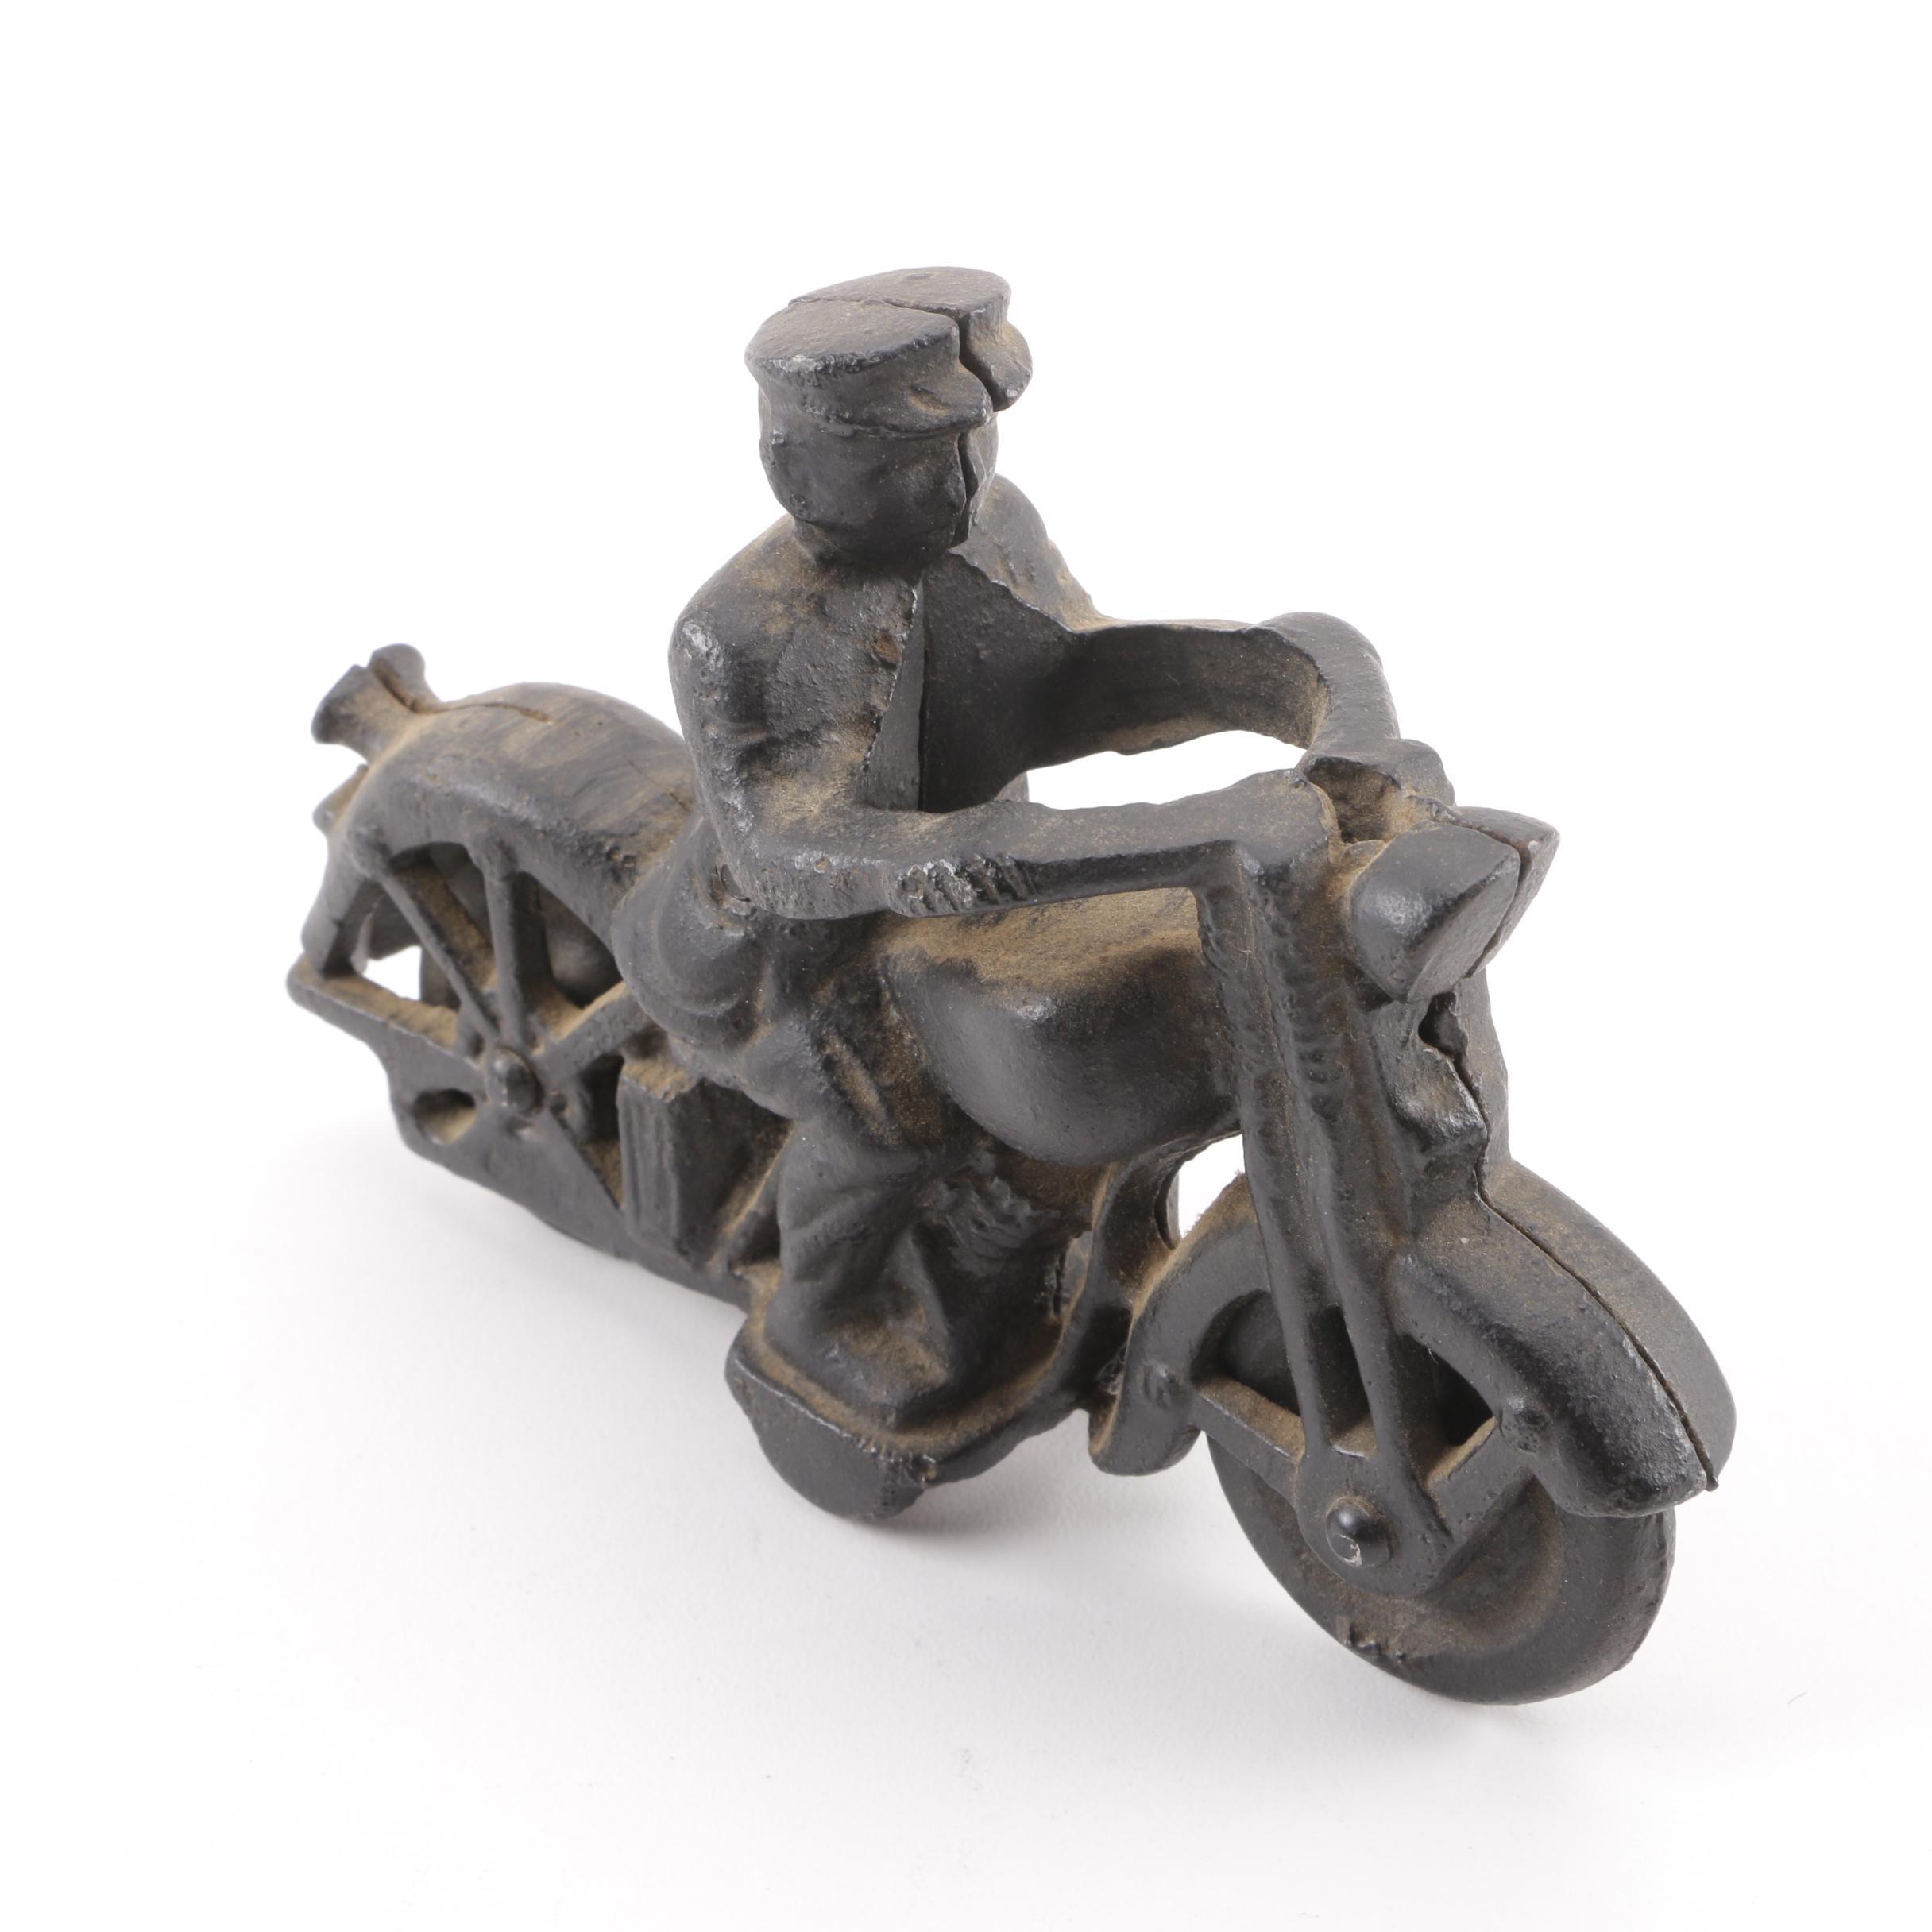 Vintage Cast Iron Motorcyclist Figurine